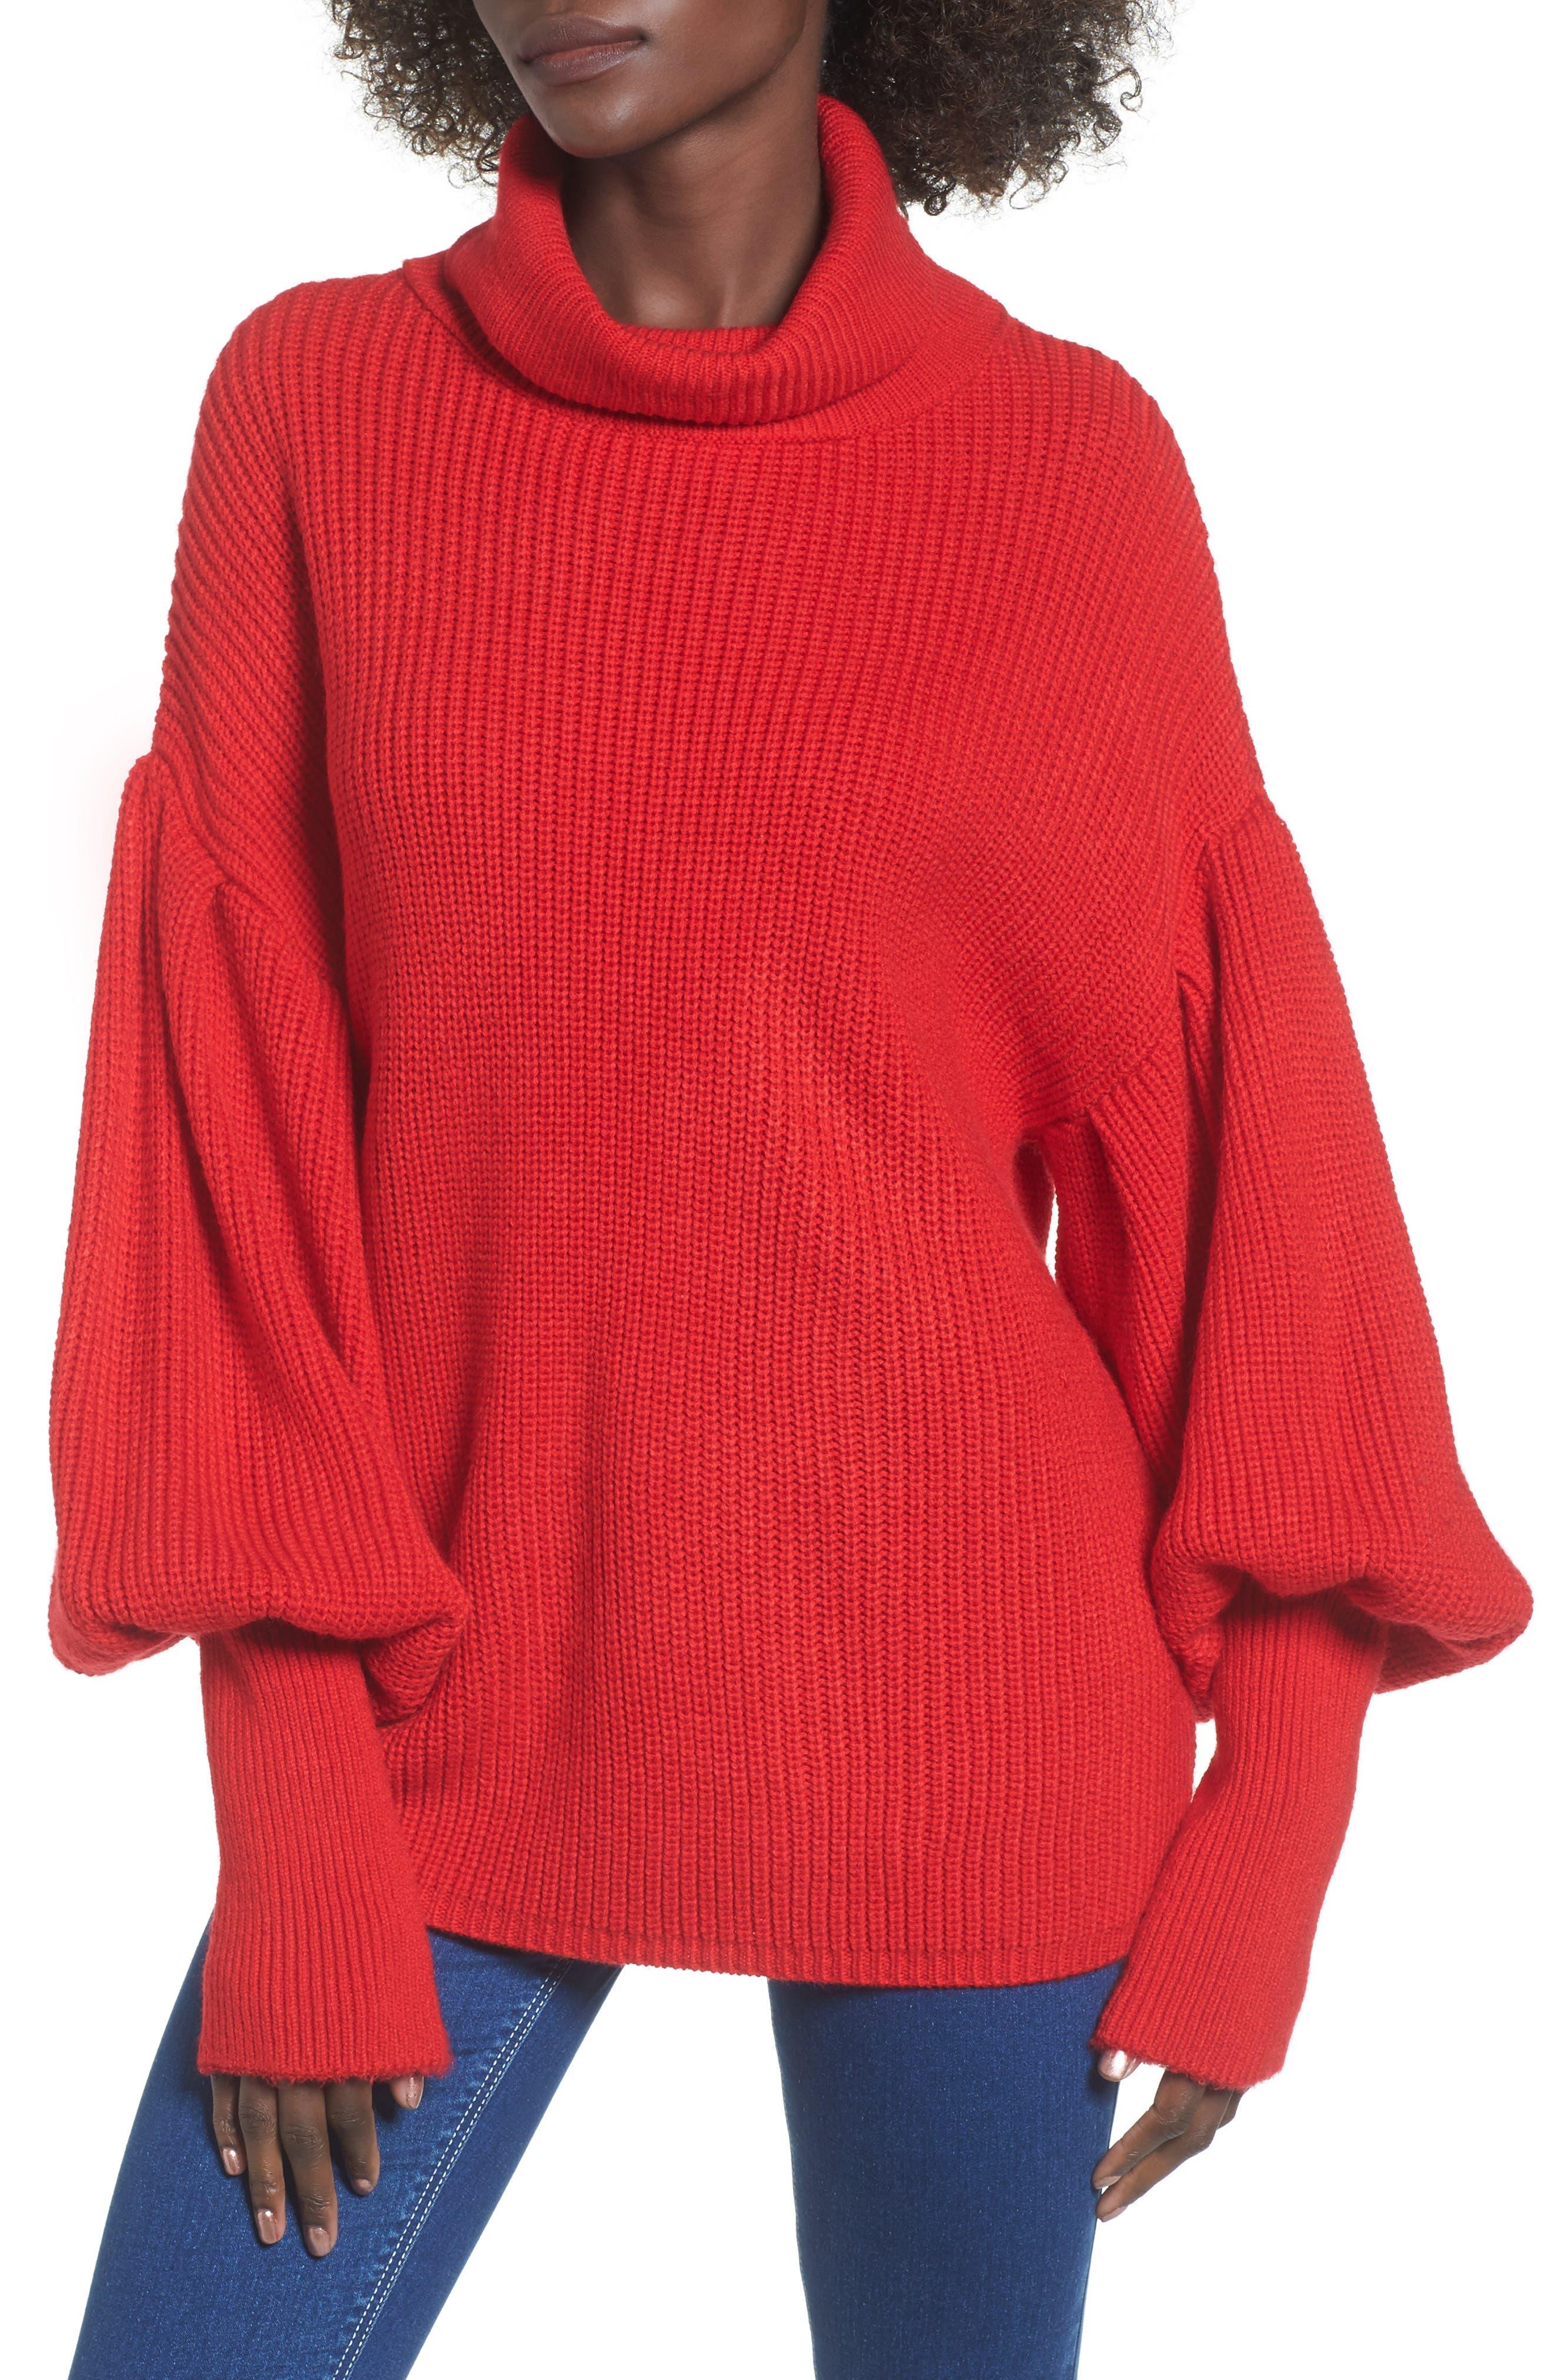 Main Image - Topshop Balloon Sleeve Turtleneck Sweater